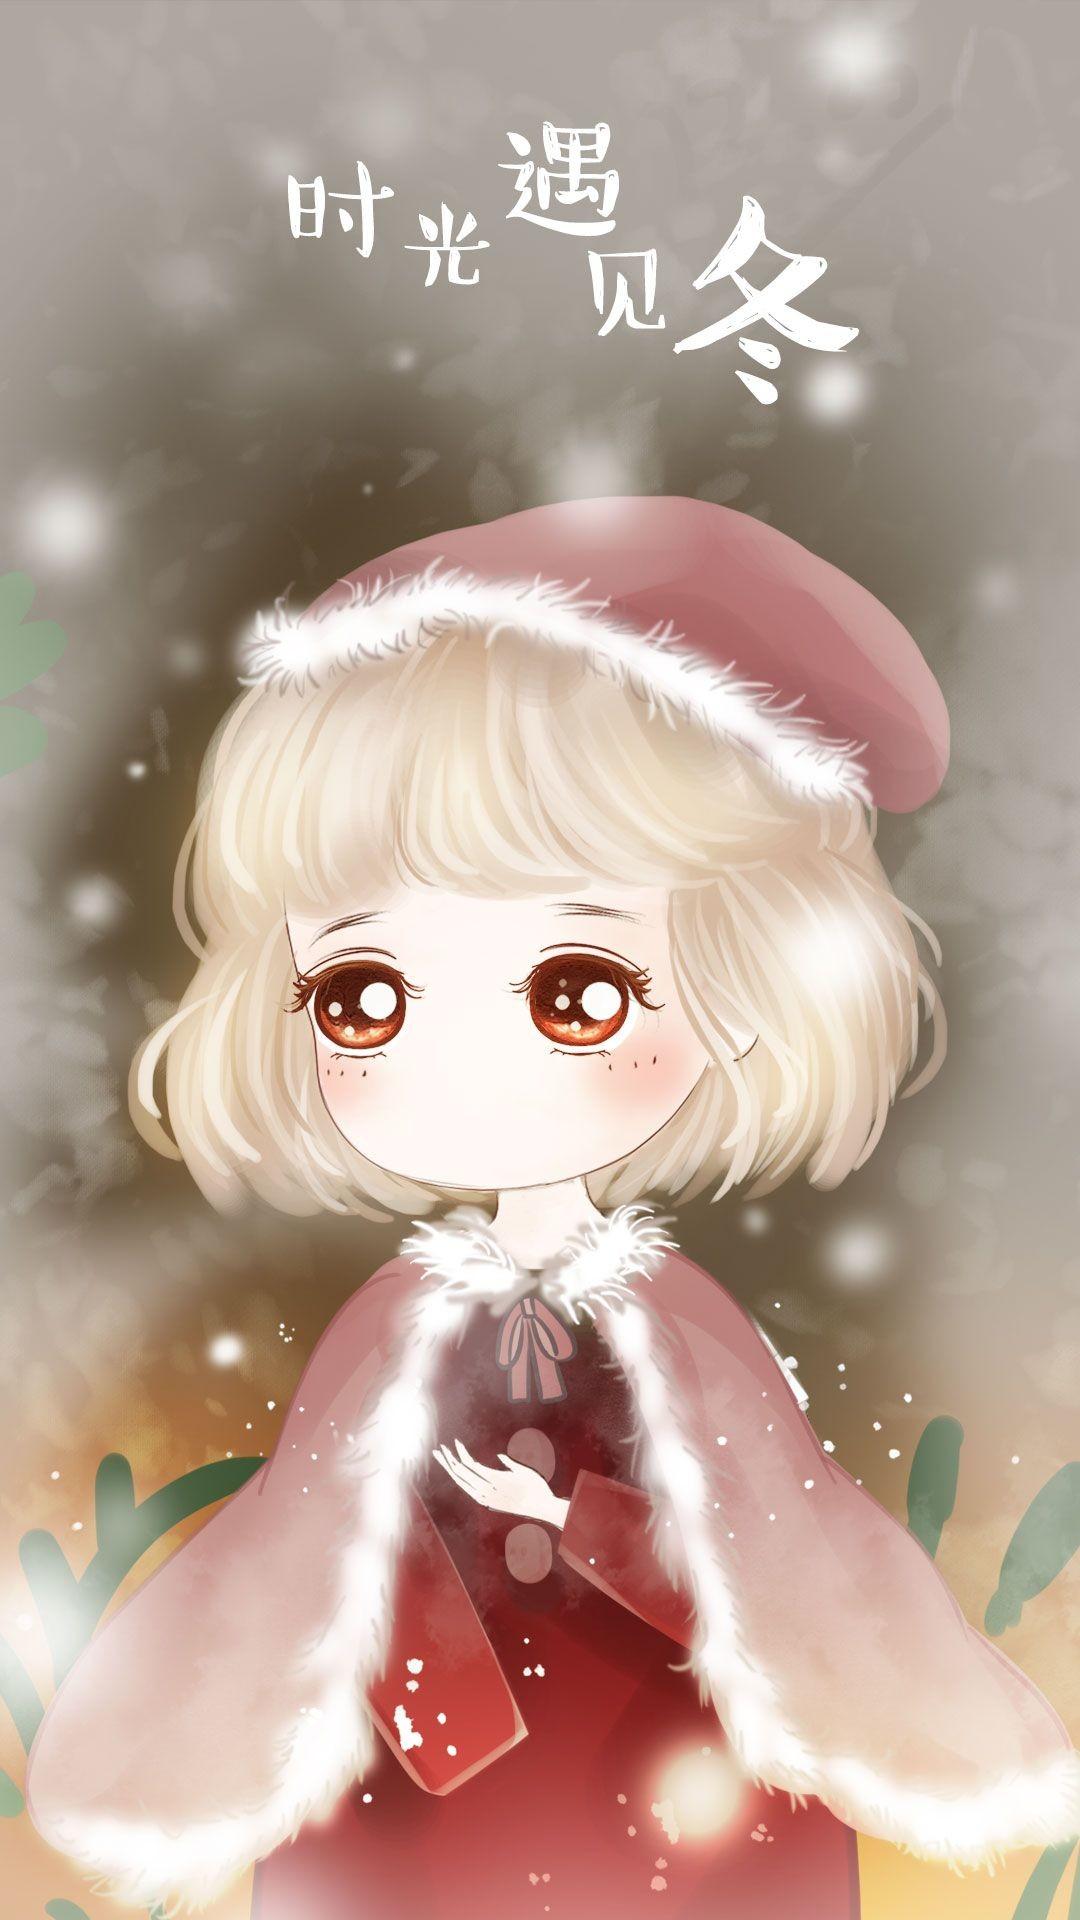 Res: 1080x1920, Kawaii Chibi, Anime Chibi, Galaxy Wallpaper, Panda, Christmas Cards,  Wallpapers, Tumblr Backgrounds, Drawings, Kawaii Drawings